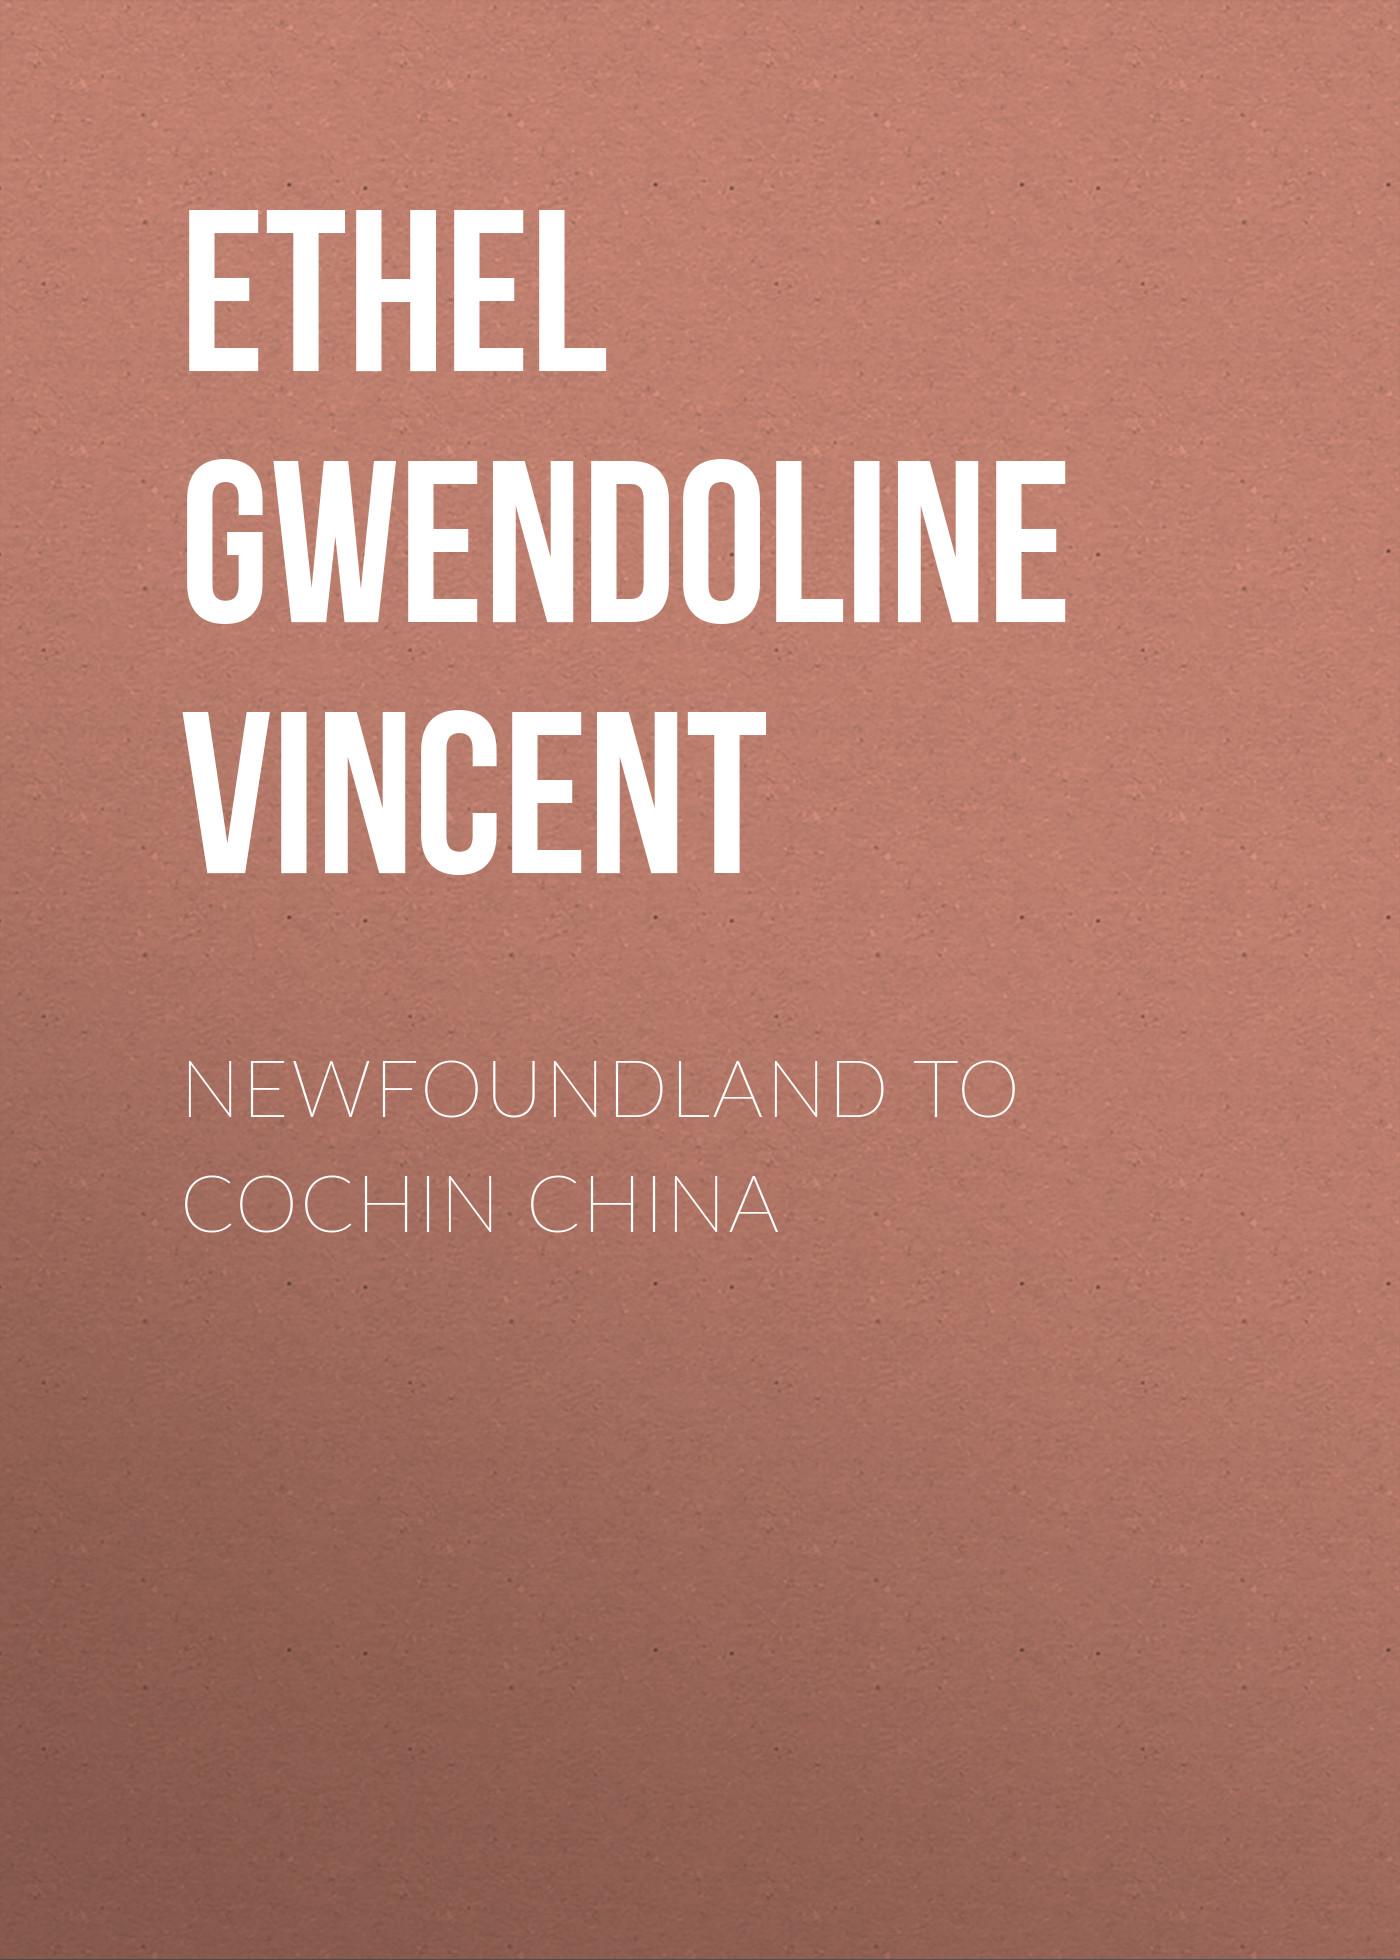 Ethel Gwendoline Vincent Newfoundland to Cochin China sir humphrey gilbert s voyage to newfoundland